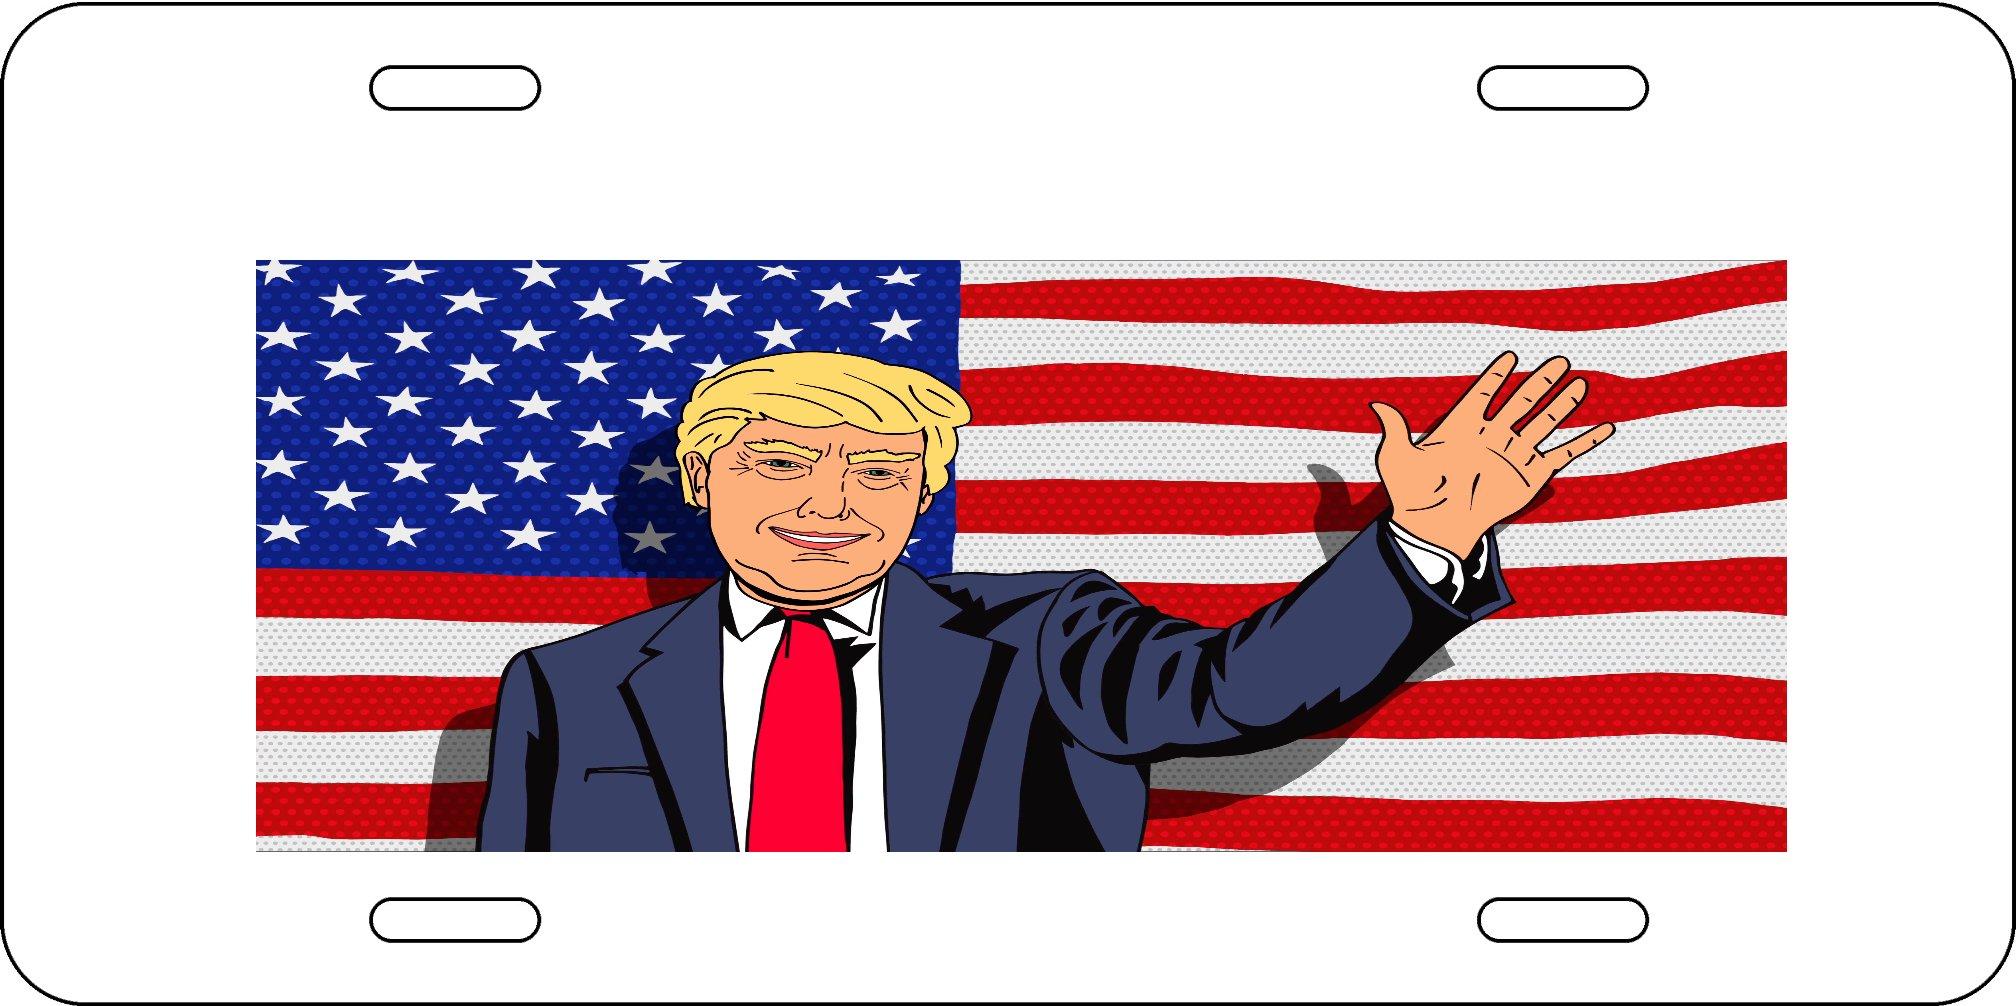 American Flag Caricature Cartoon President Caricature Aluminum License Plate for Car Truck Vehicles